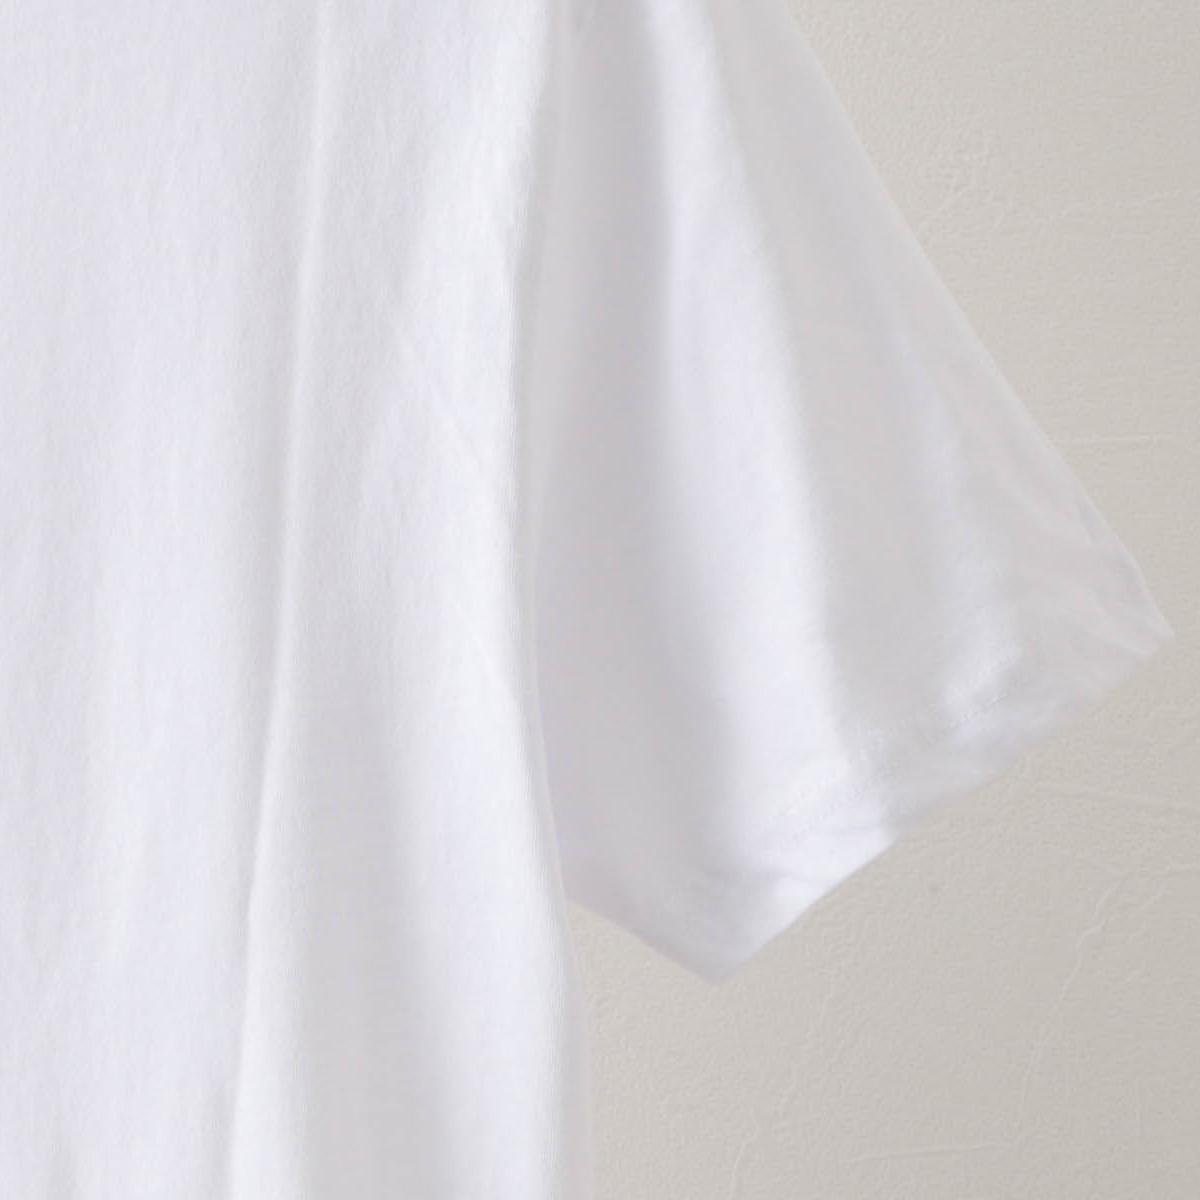 Tシャツ ドゥードゥルプリント 2色 グリーン ホワイト オーガニックコットン レギュラーフィット Ben Sherman ベンシャーマン